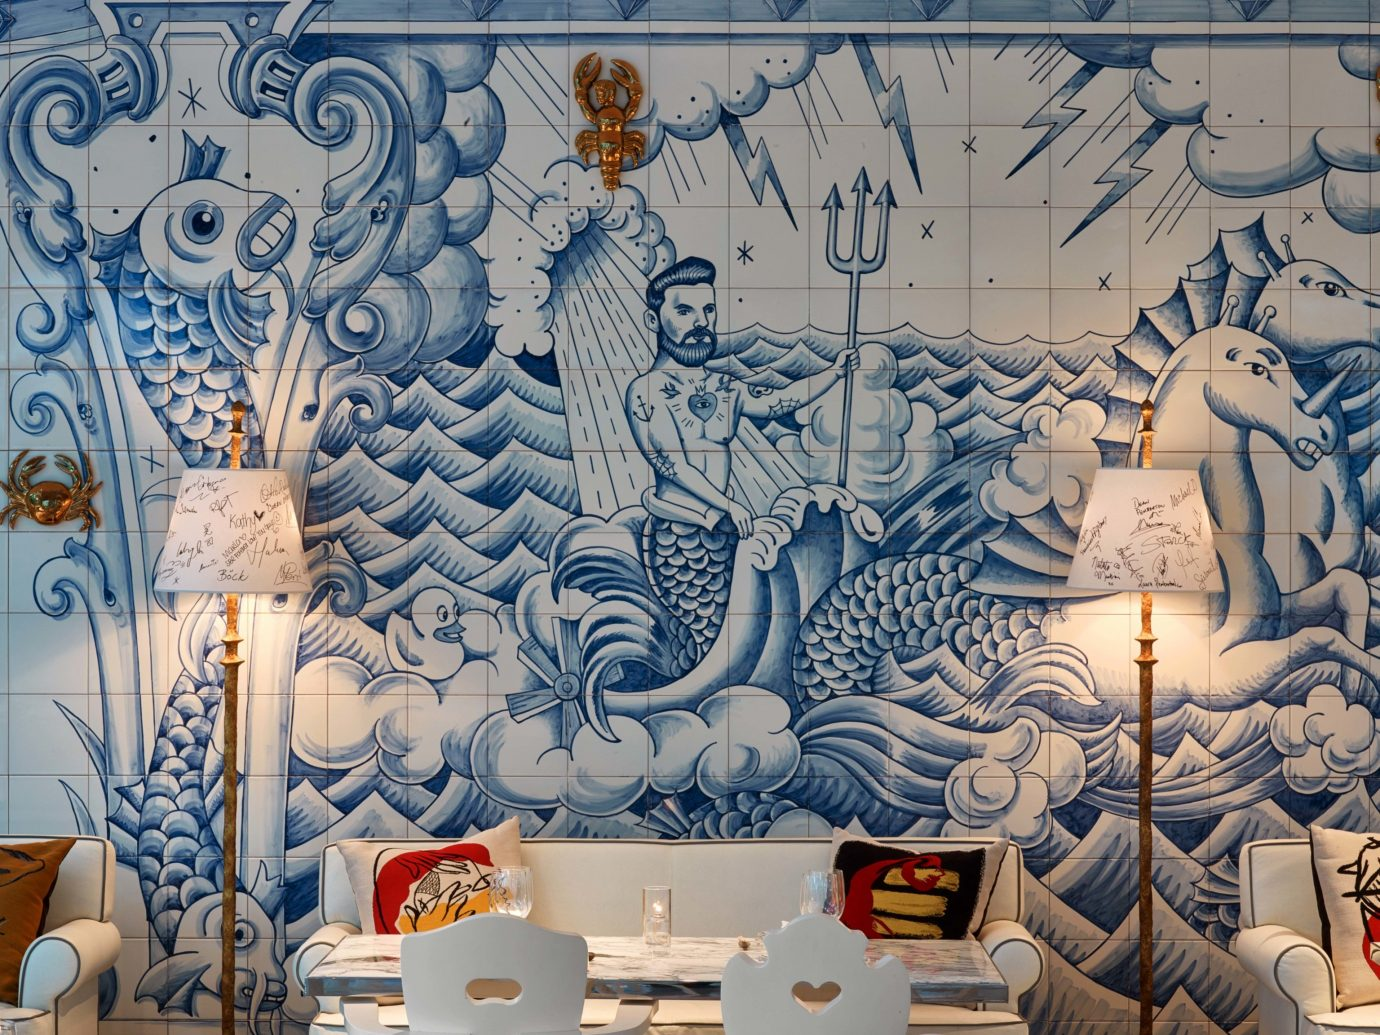 Food + Drink Girls Getaways Hotels Jetsetter Guides shopping Style + Design Weekend Getaways wall mural indoor art Design interior design modern art decorated illustration painting wallpaper different several colored